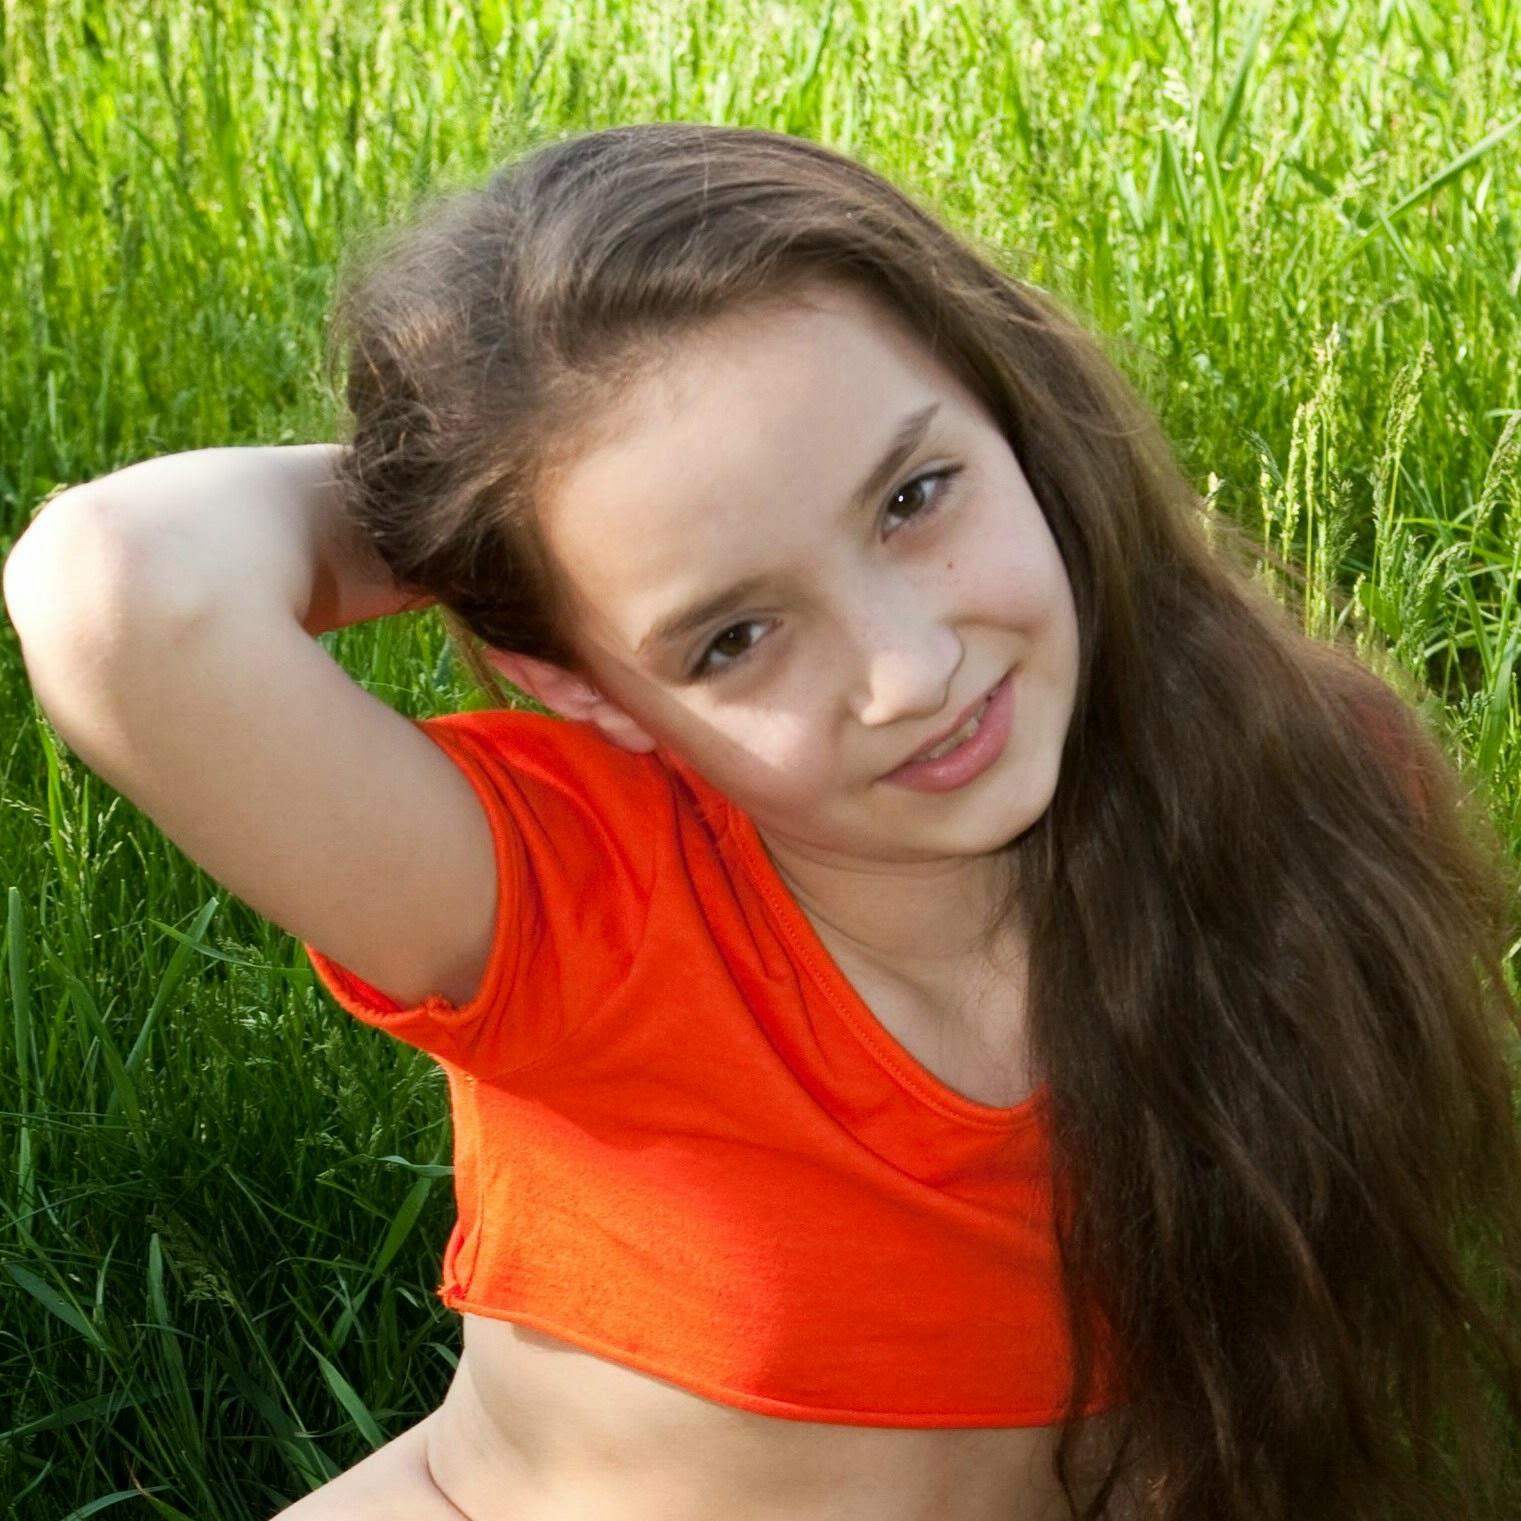 nude teen dream photo